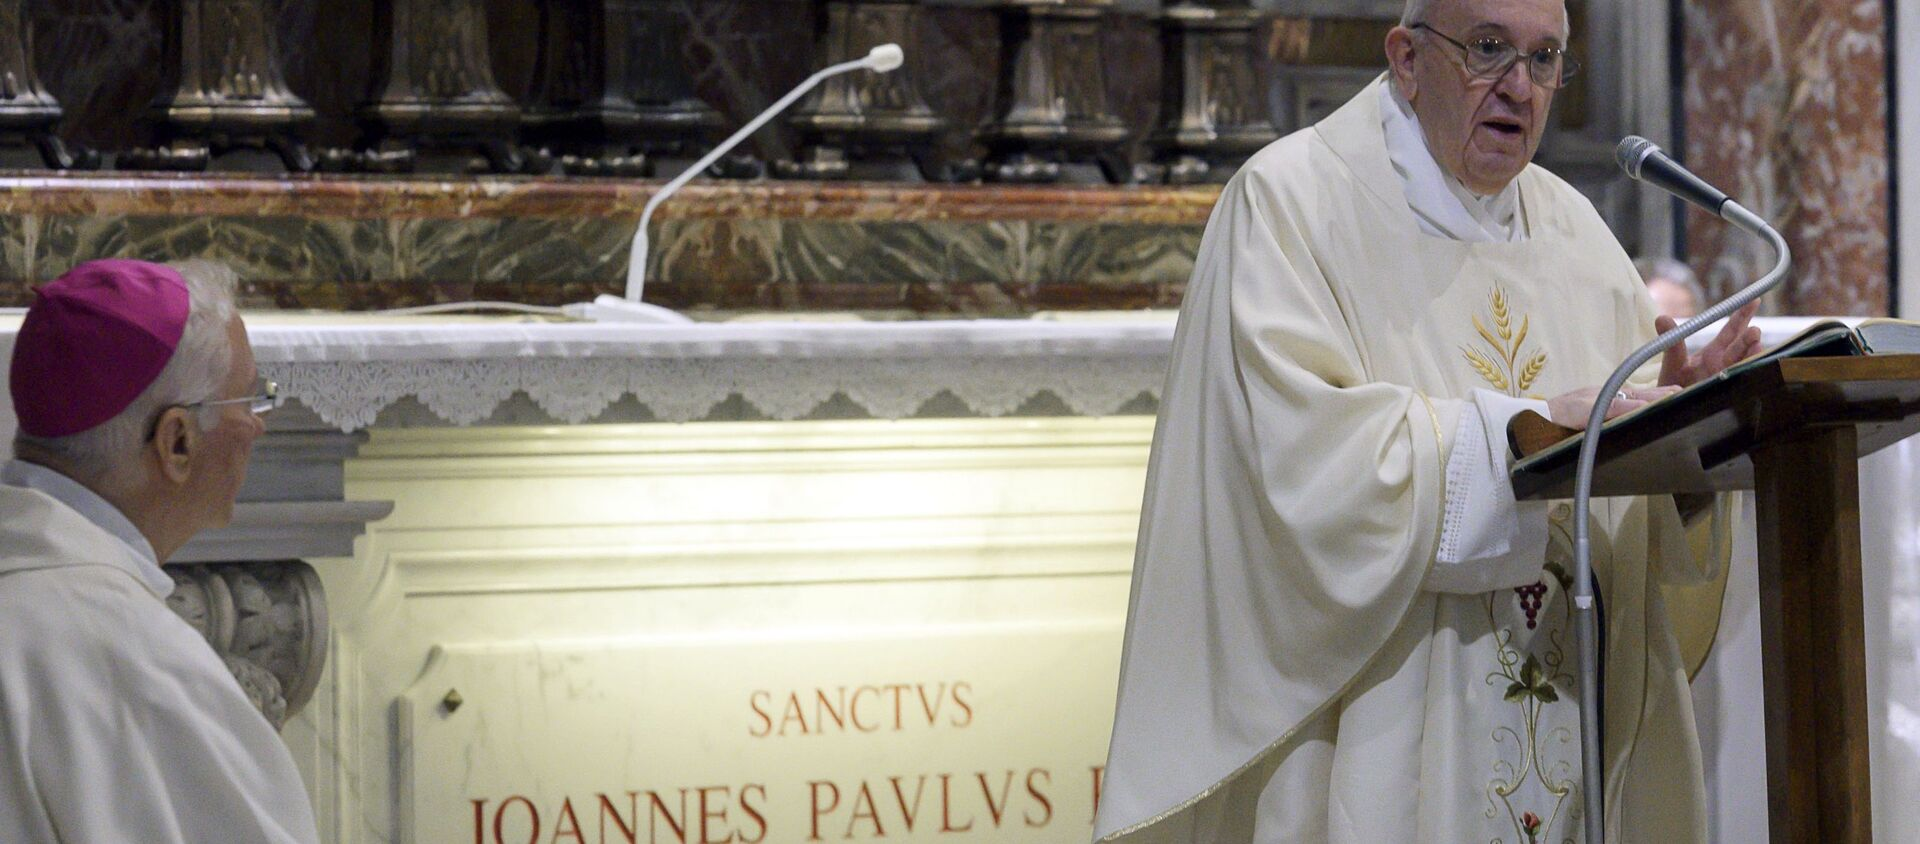 Papa Francesco celebra la messa in Vaticano - Sputnik Italia, 1920, 16.05.2021